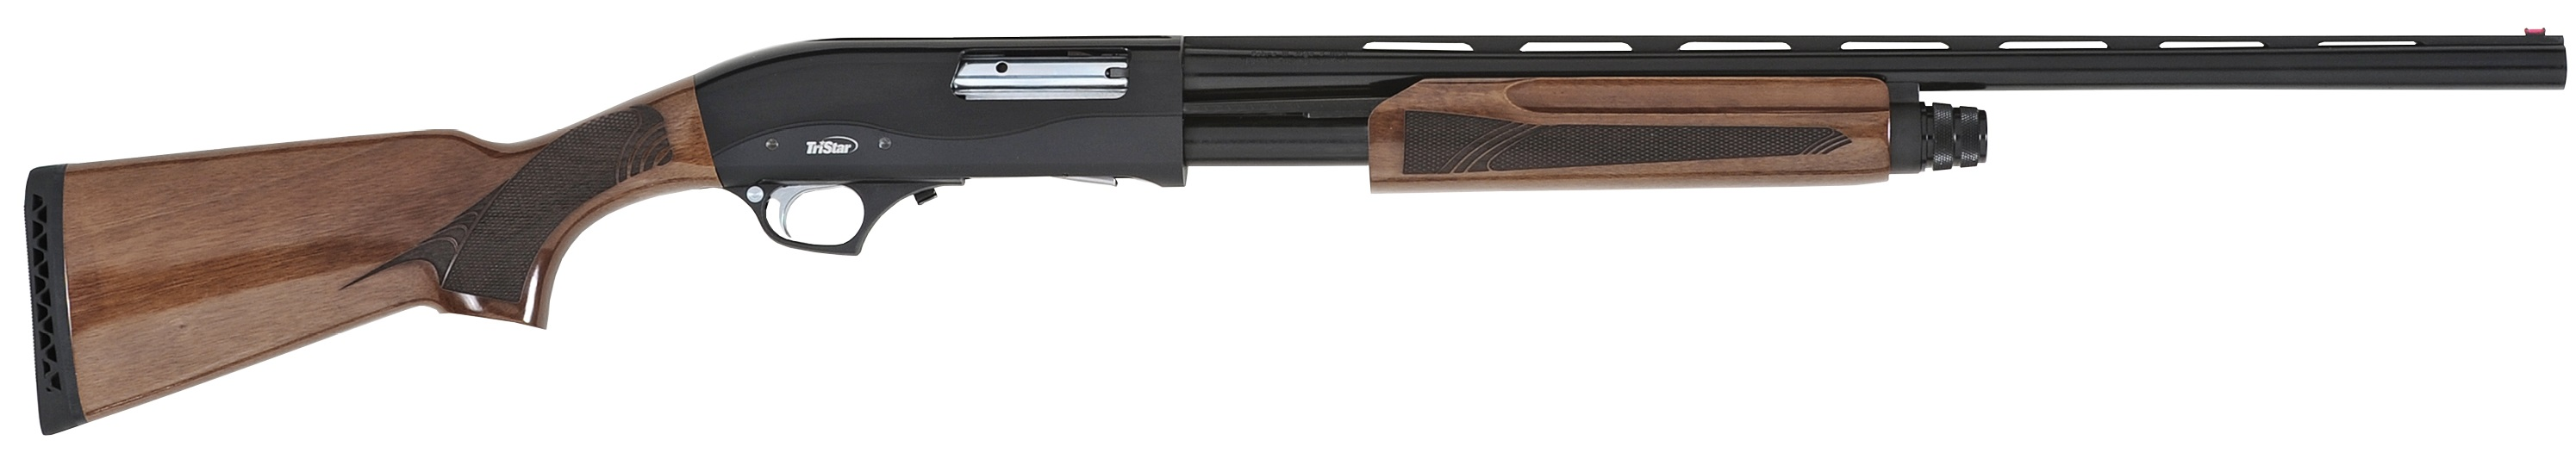 TriStar Sporting Arms TRISTAR COBRA III FIELD 20 GAUGE